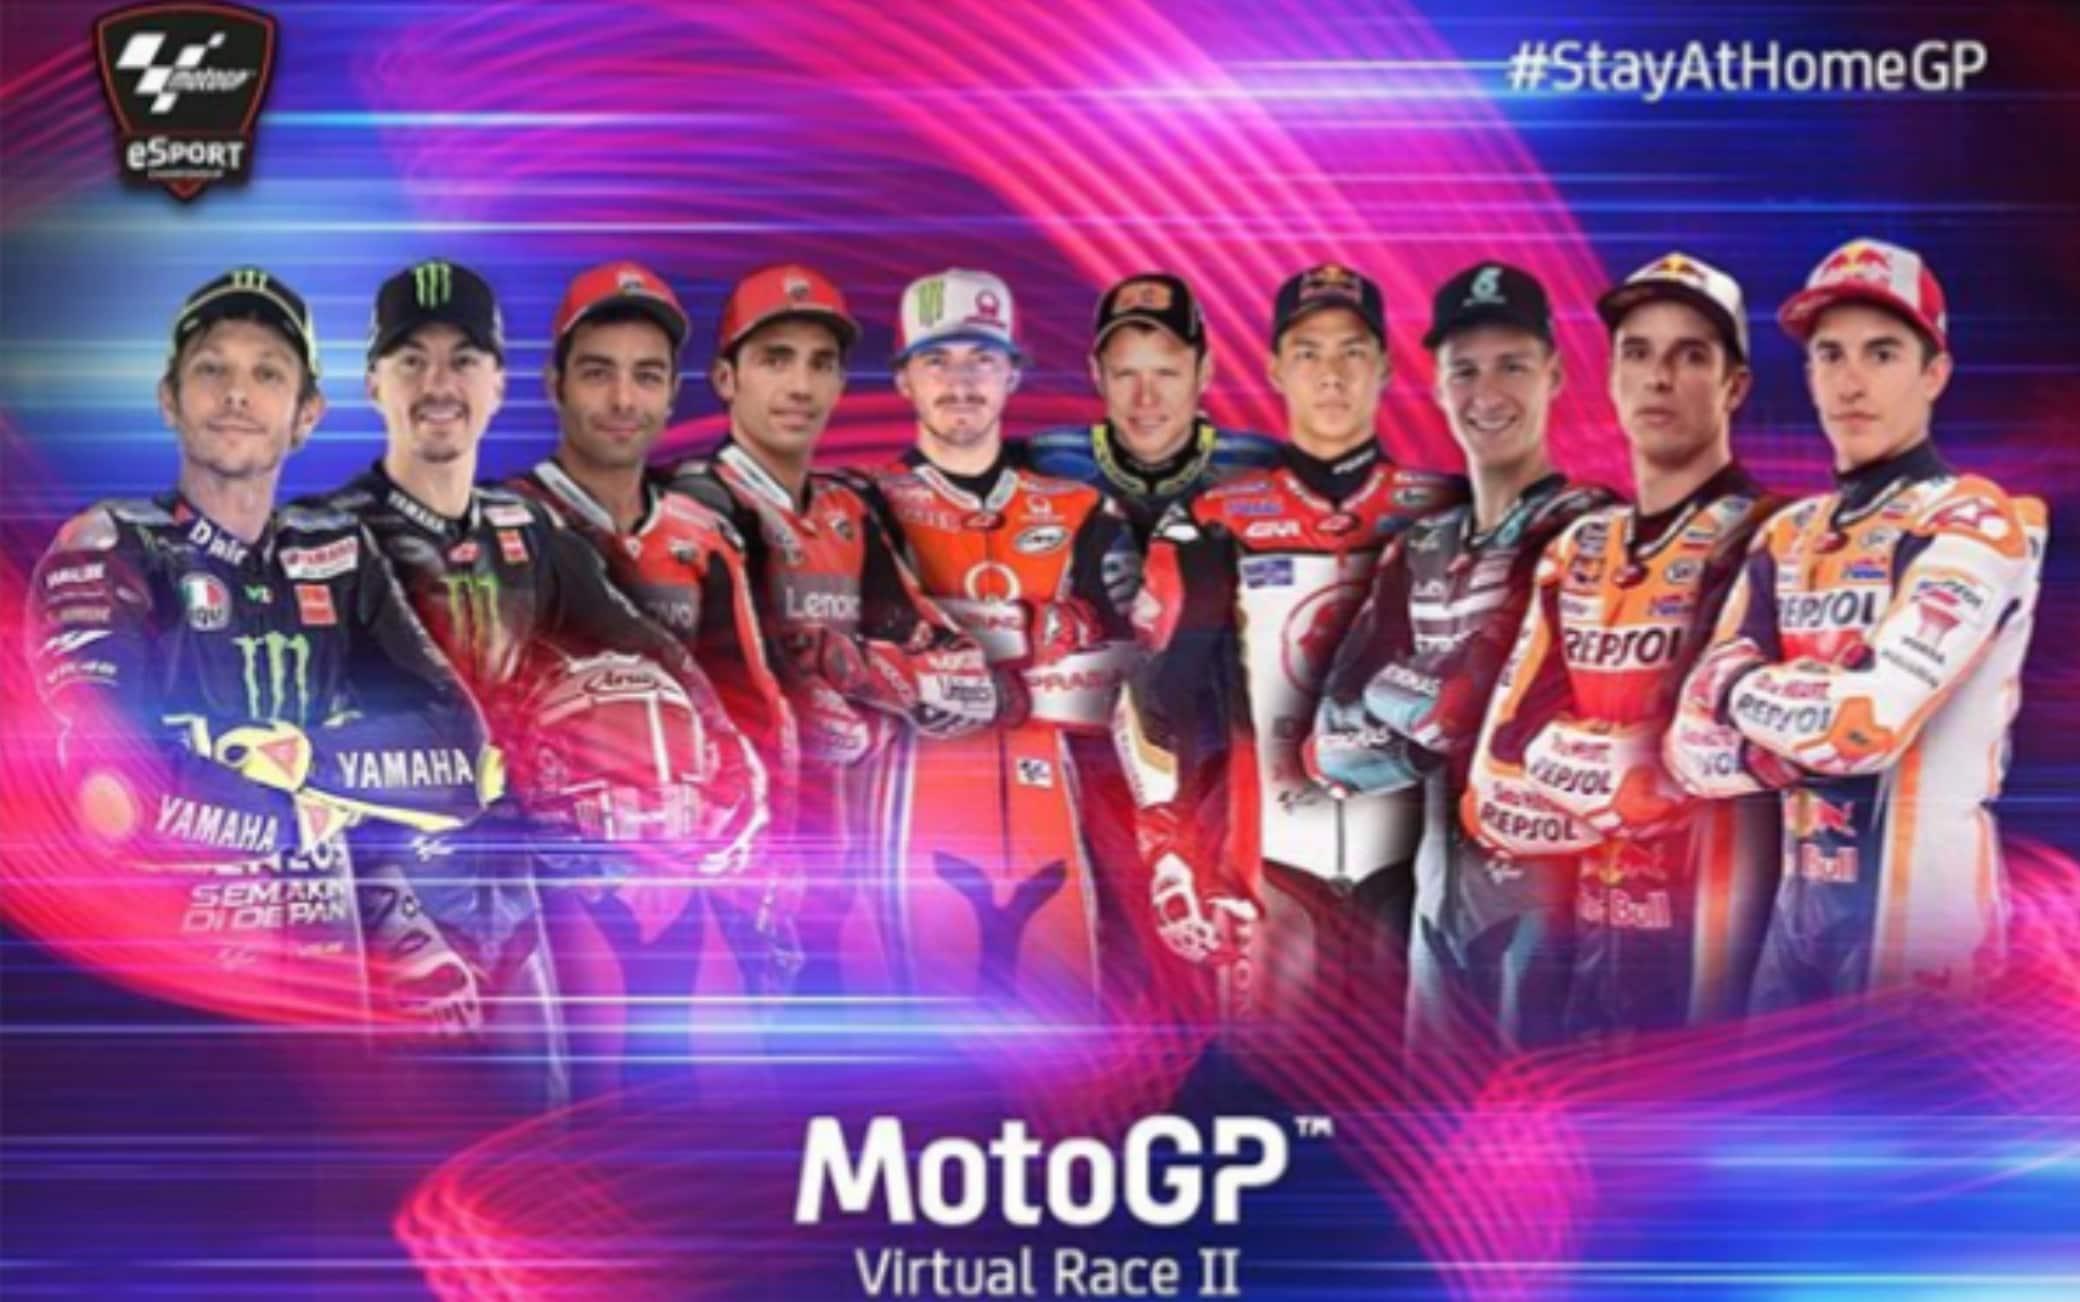 virtual race 2 motogp